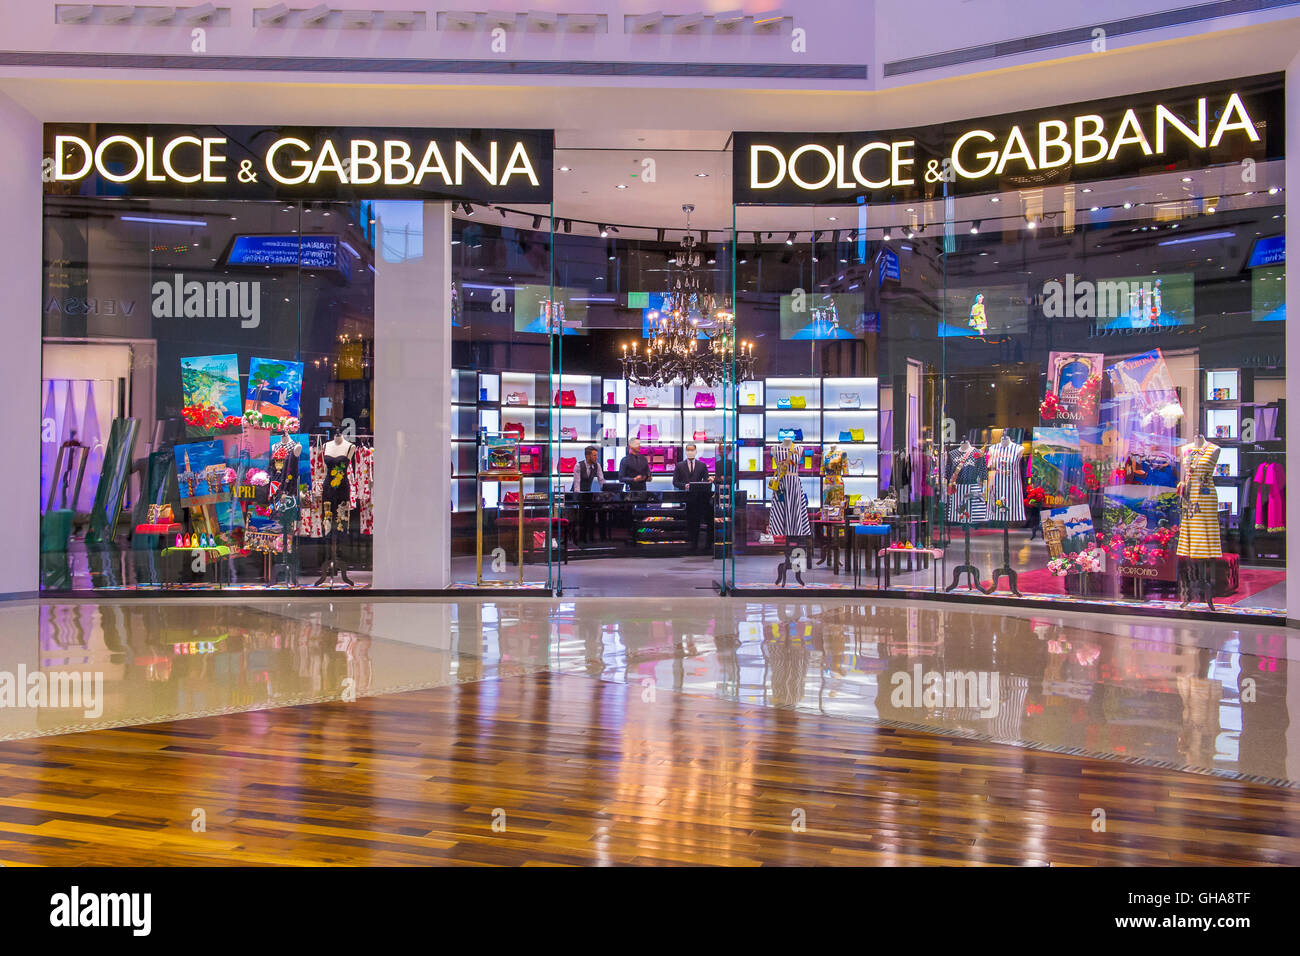 Dolce & Gabbana store in Las Vegas strip - Stock Image